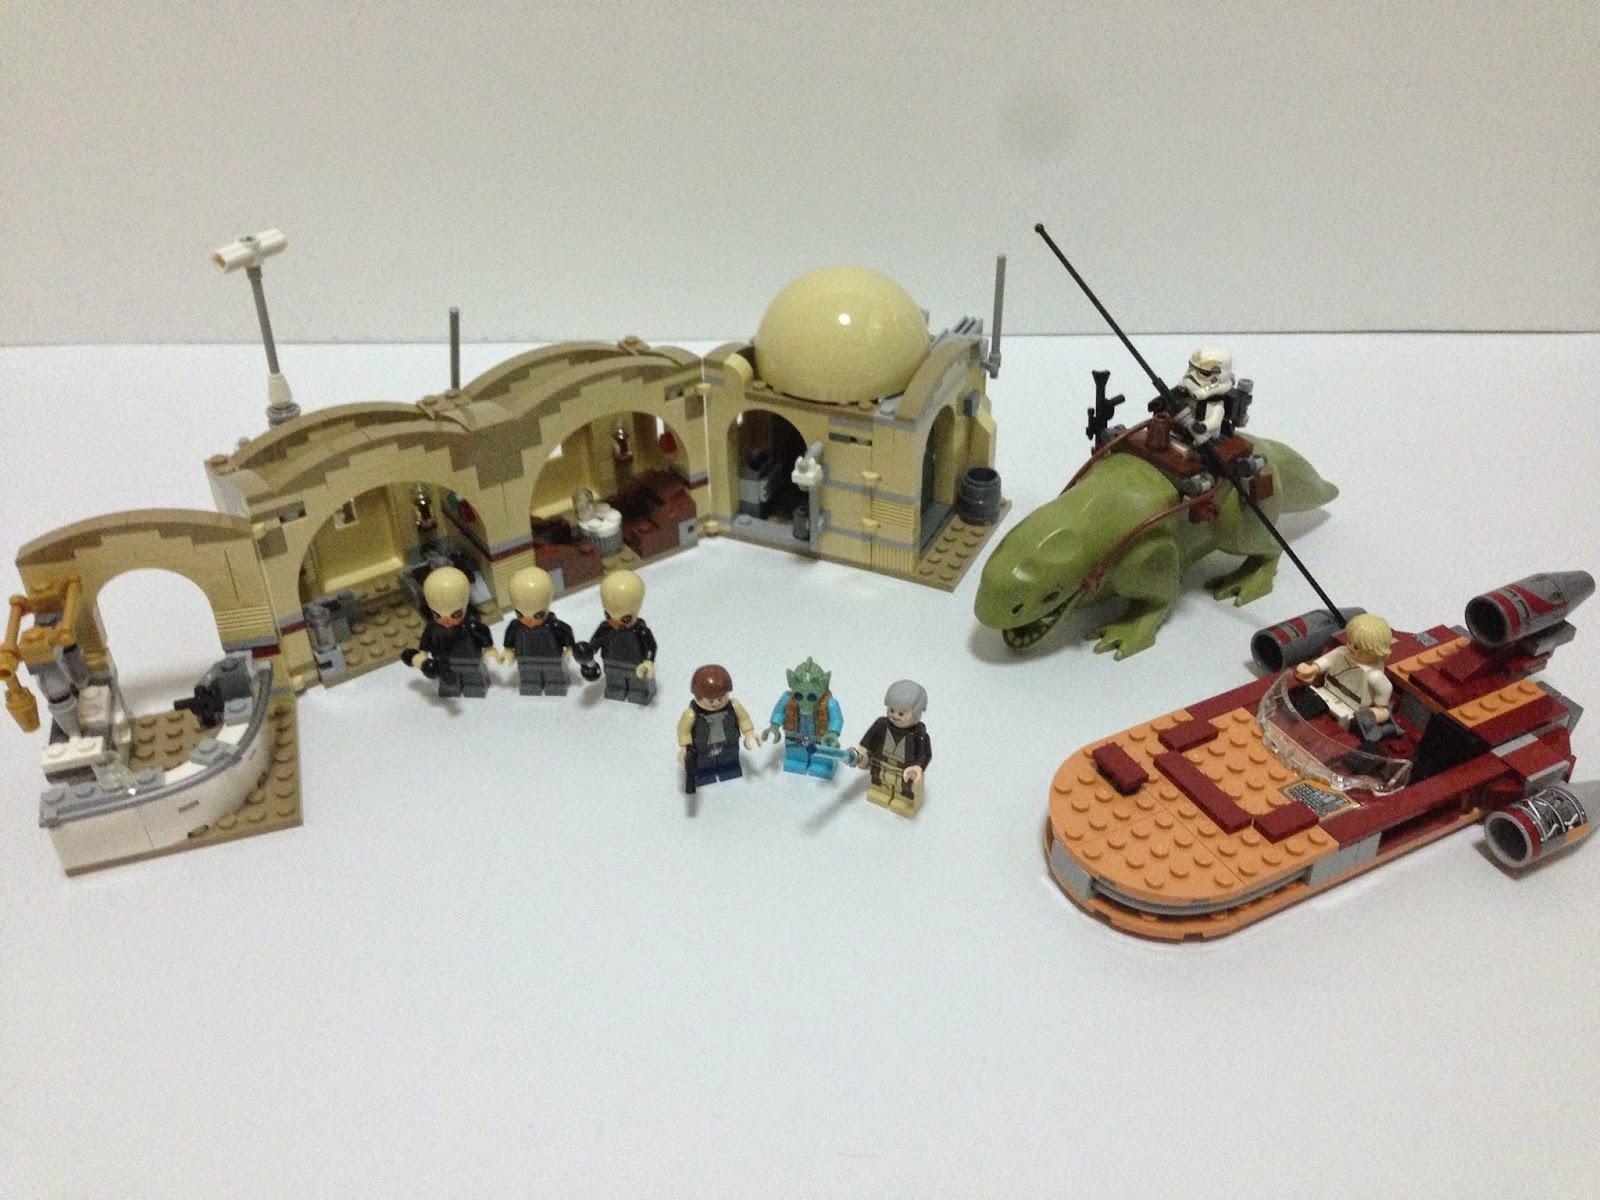 LEGO STICKER SHEET for 75052 STAR WARS MOS EISLEY CANTINA GENUINE NEW